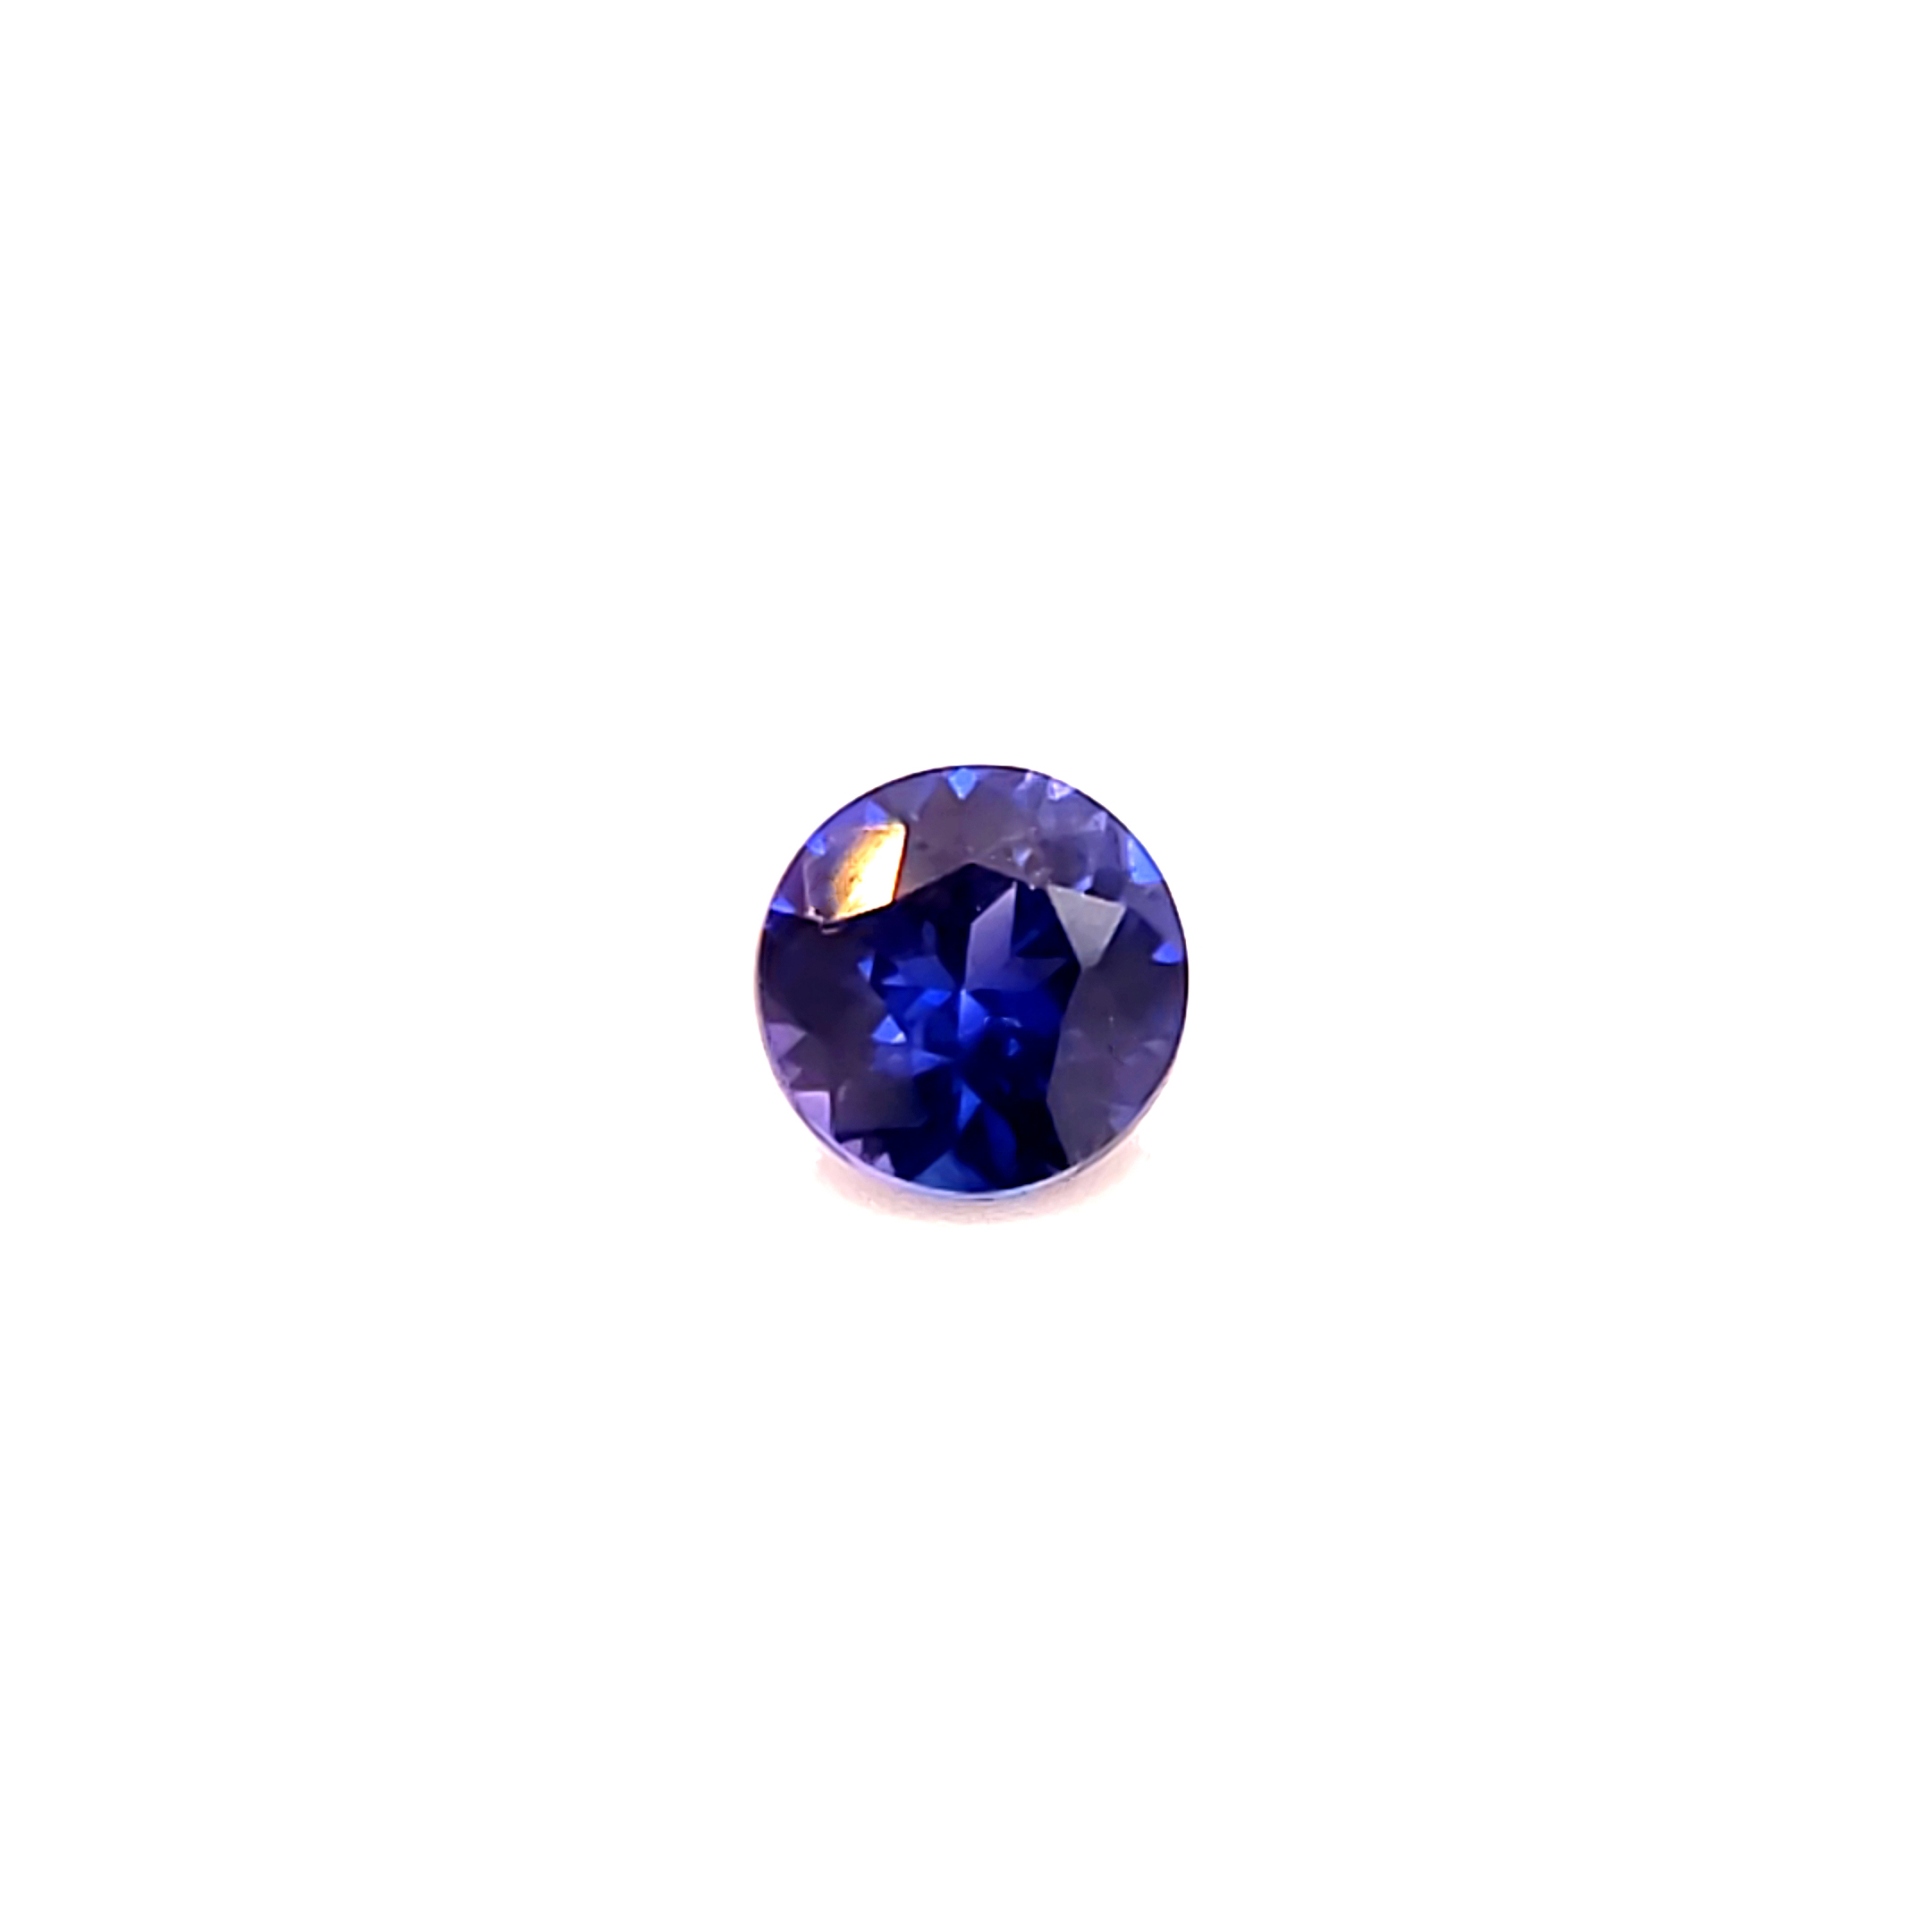 .48 ct. Color Change Sapphire